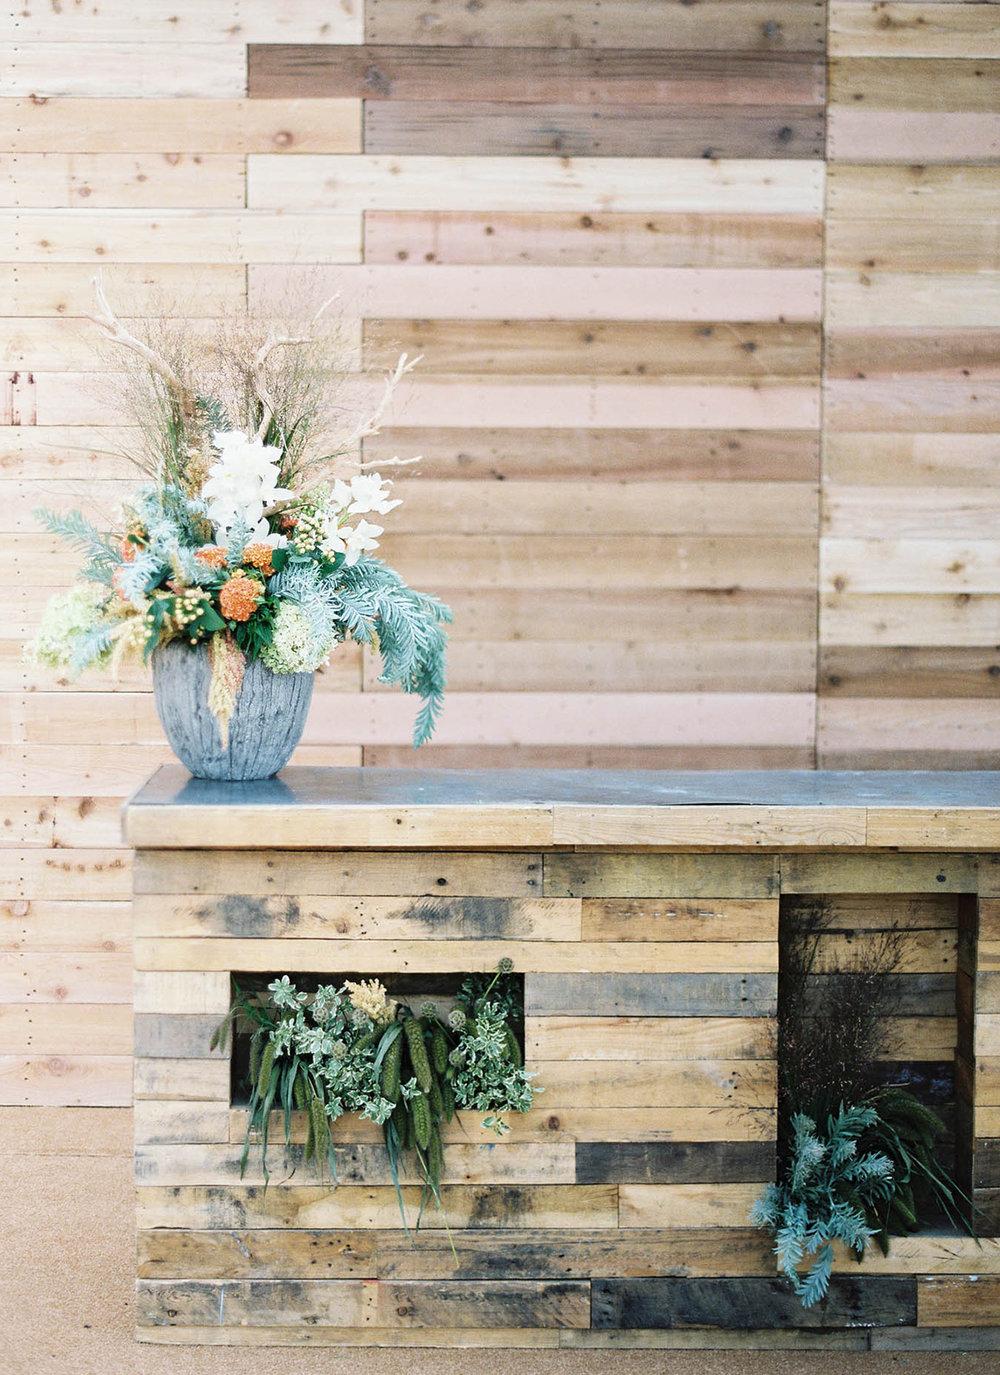 ArchitectureMeetsRomanceWedding-Amaryllis-9.jpg